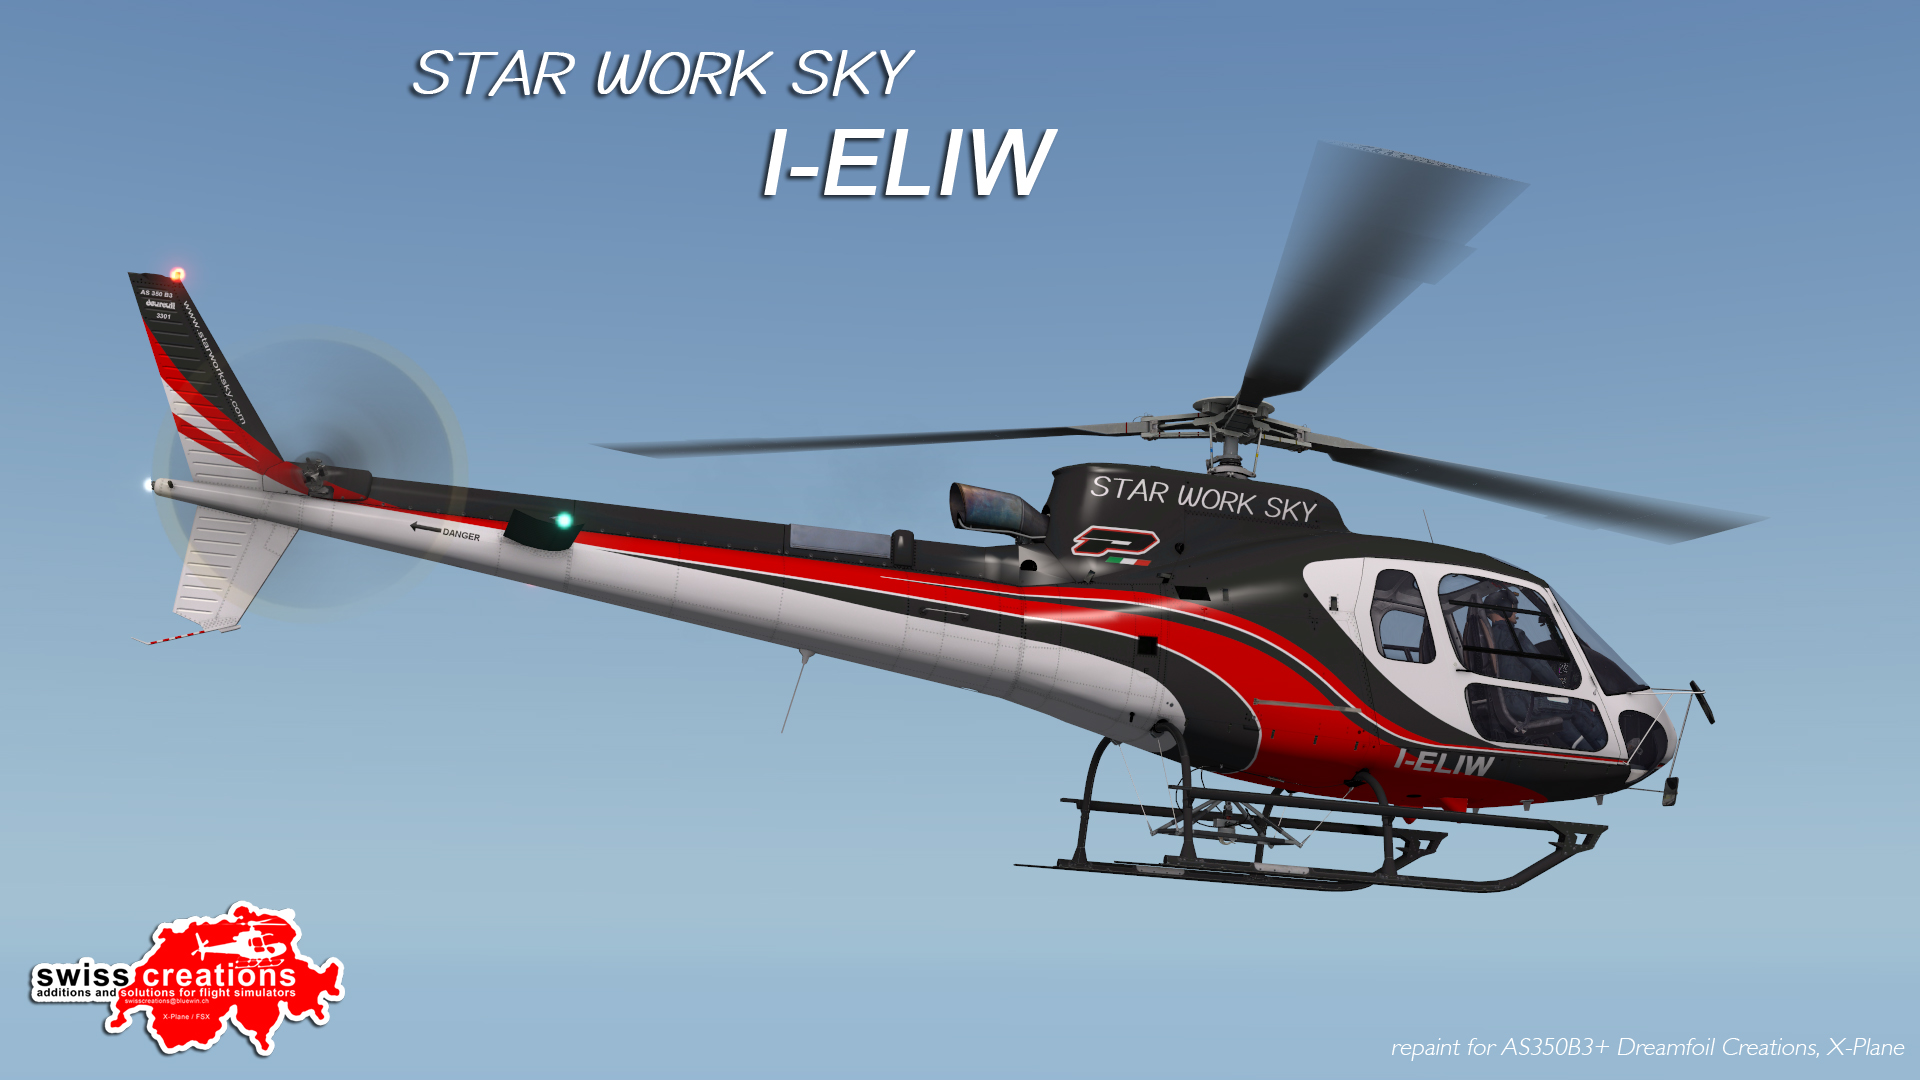 Elicottero B3 : Elicottero elettrico telecomandato rc oxy lynx classe fbl